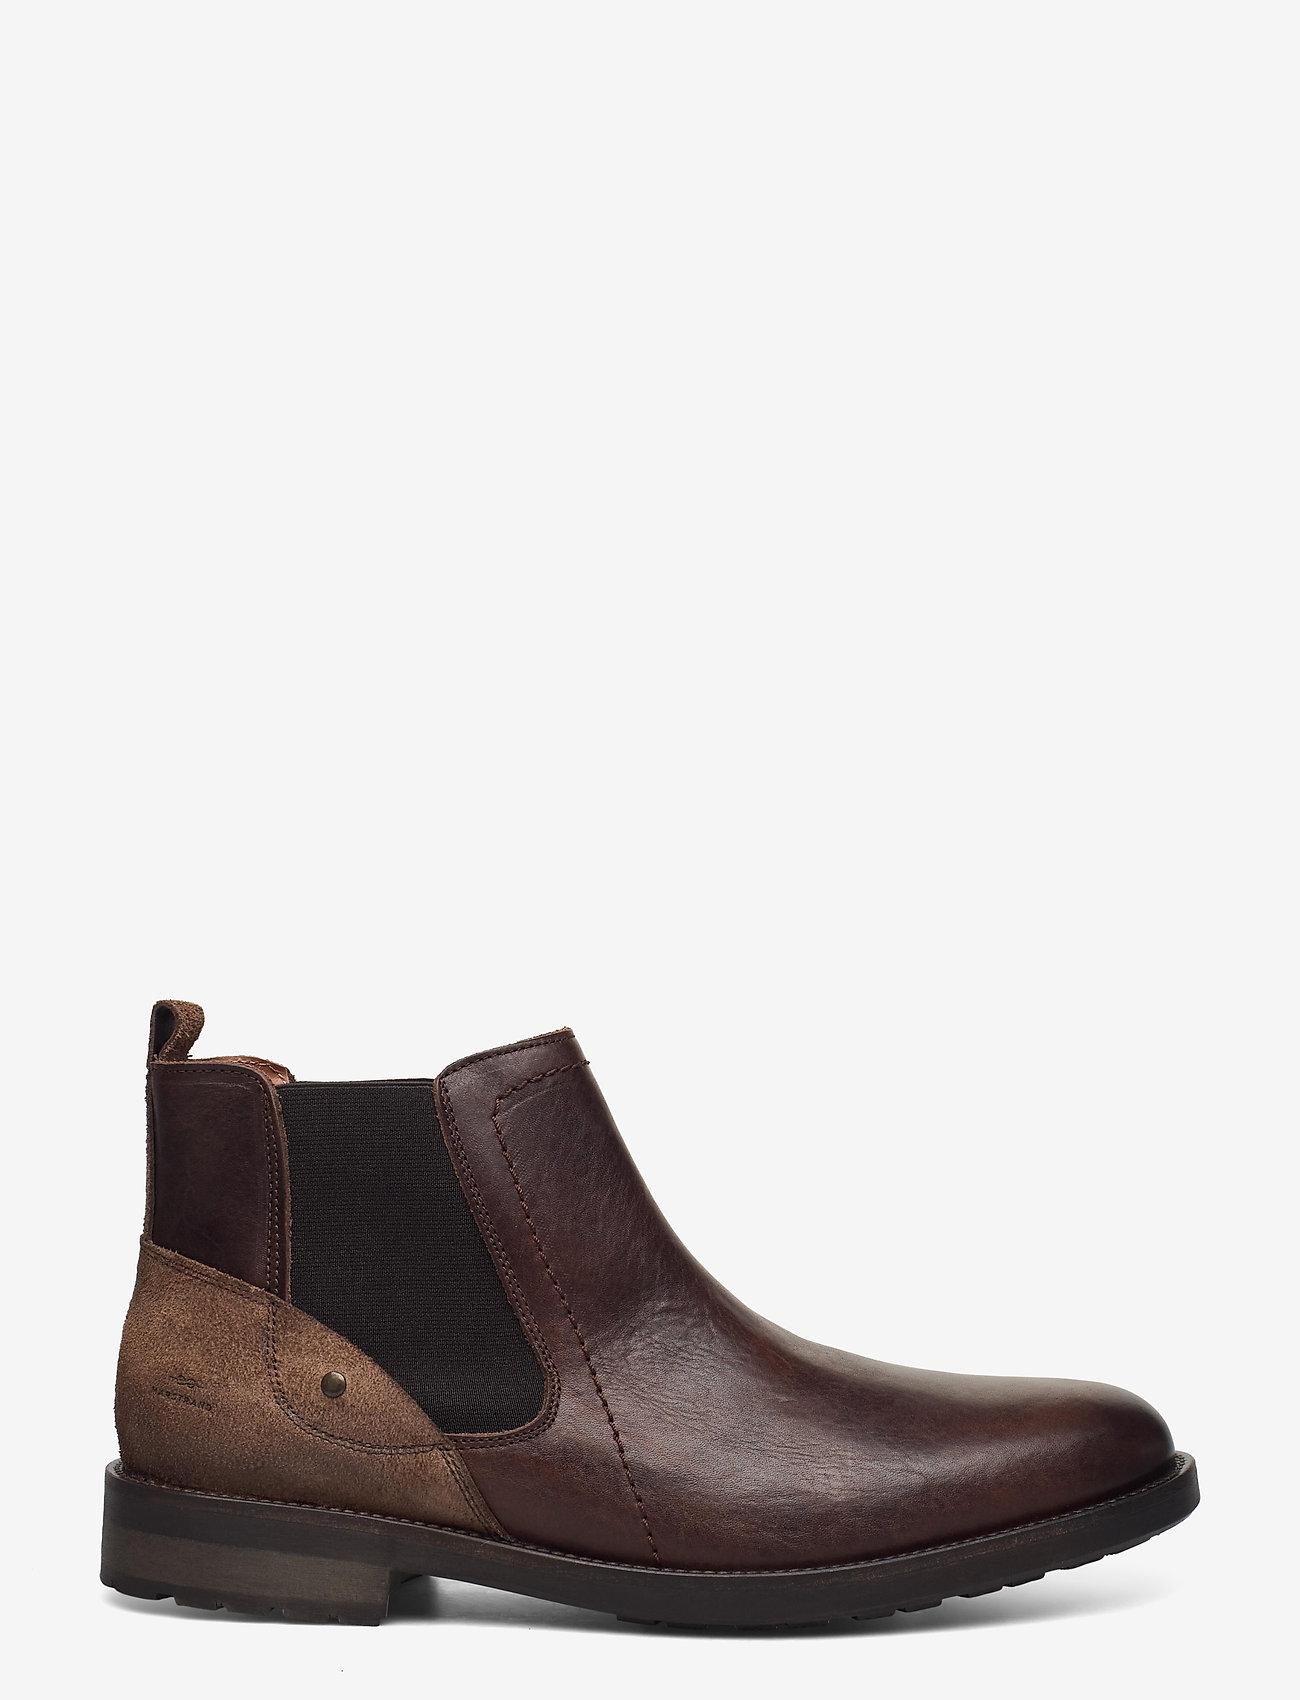 Marstrand - ALFIE MARSTRAND KÄNGA - chelsea boots - dark brown - 1